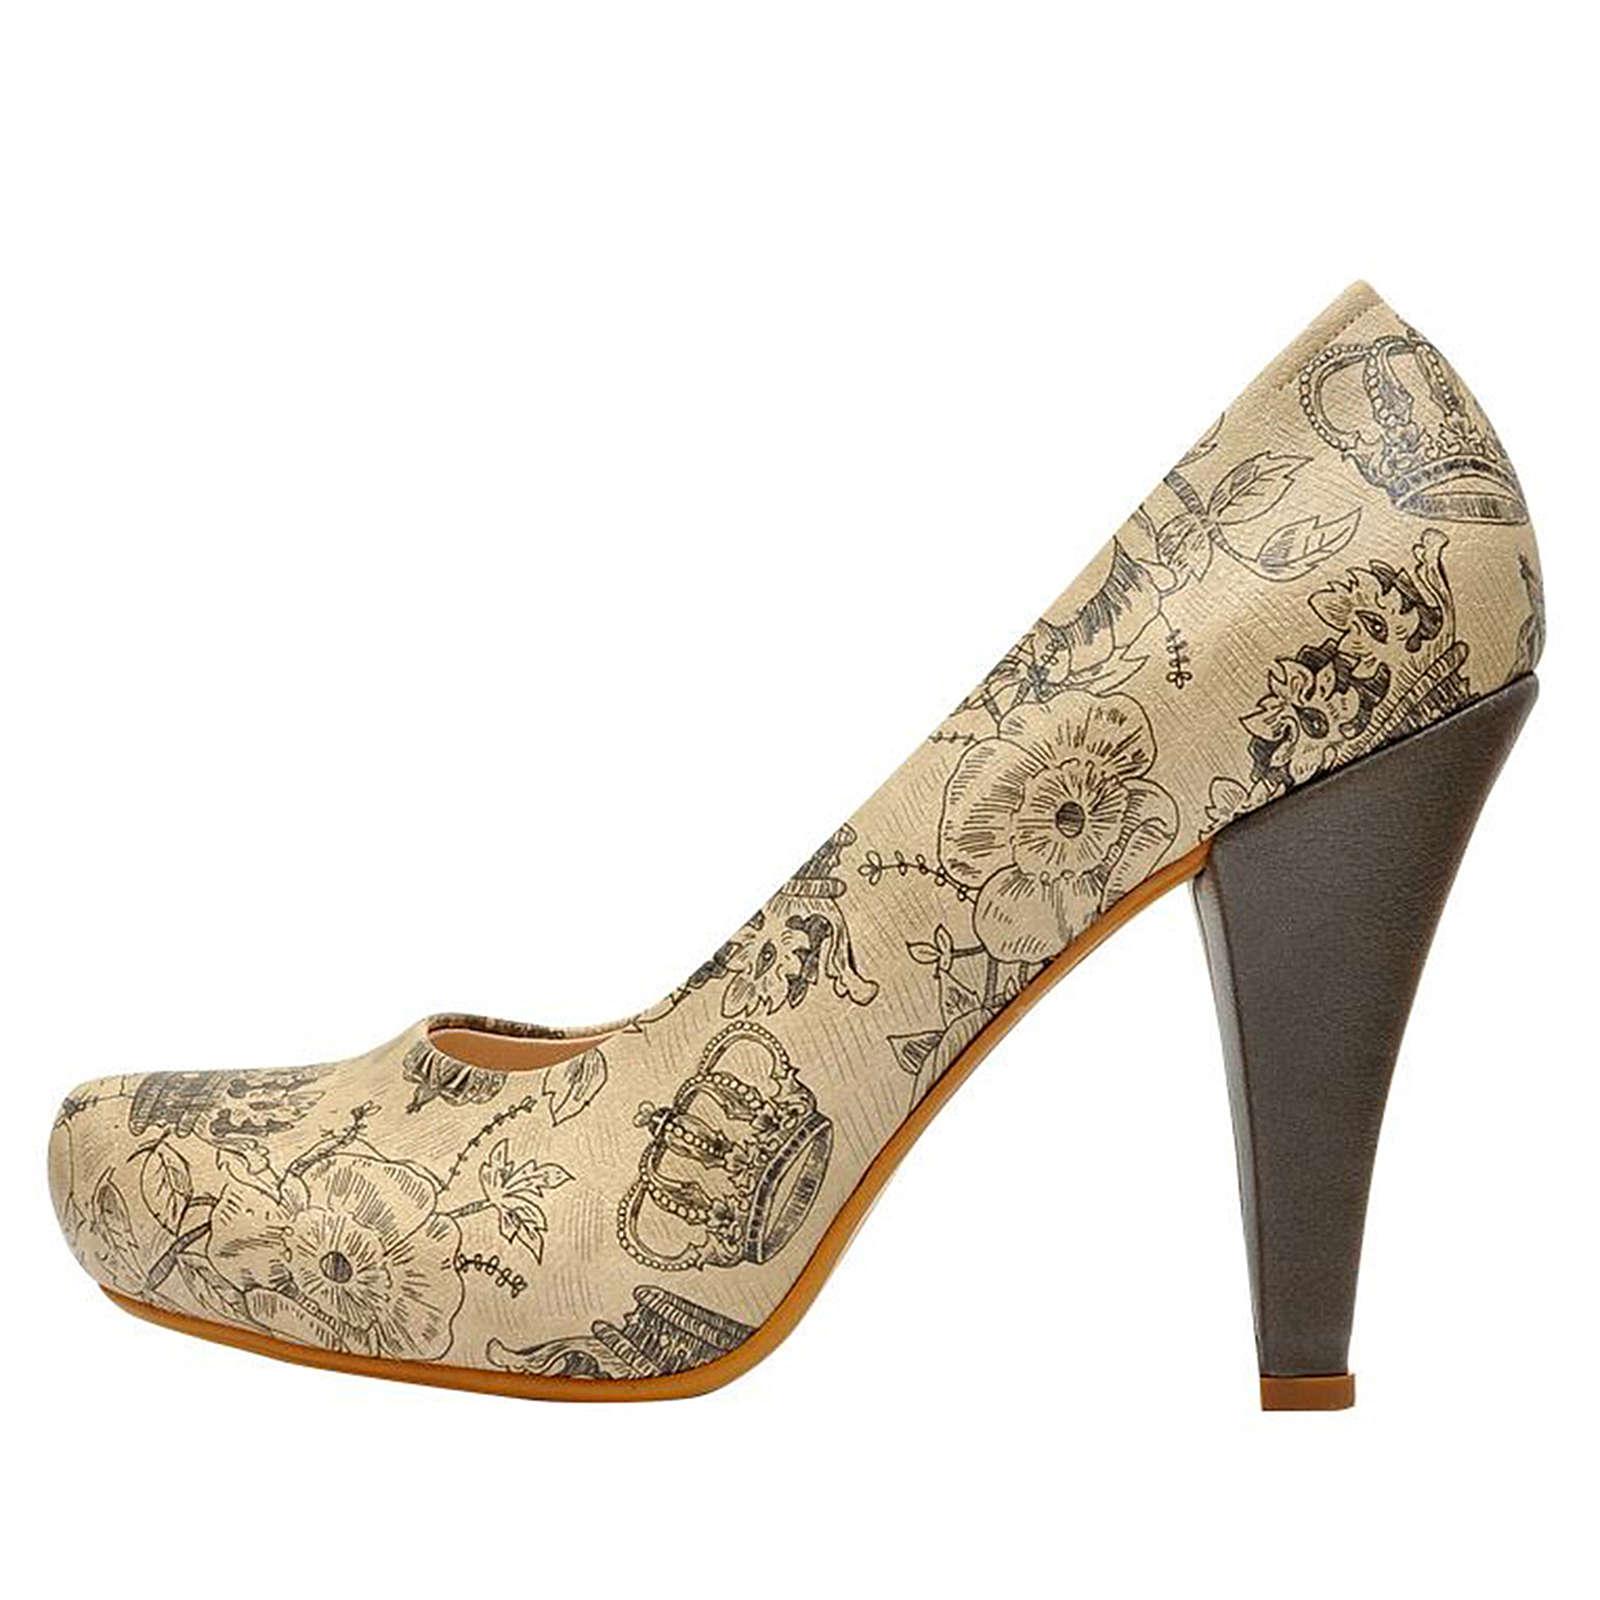 Dogo Shoes Royal Klassische Pumps mehrfarbig Damen Gr. 36